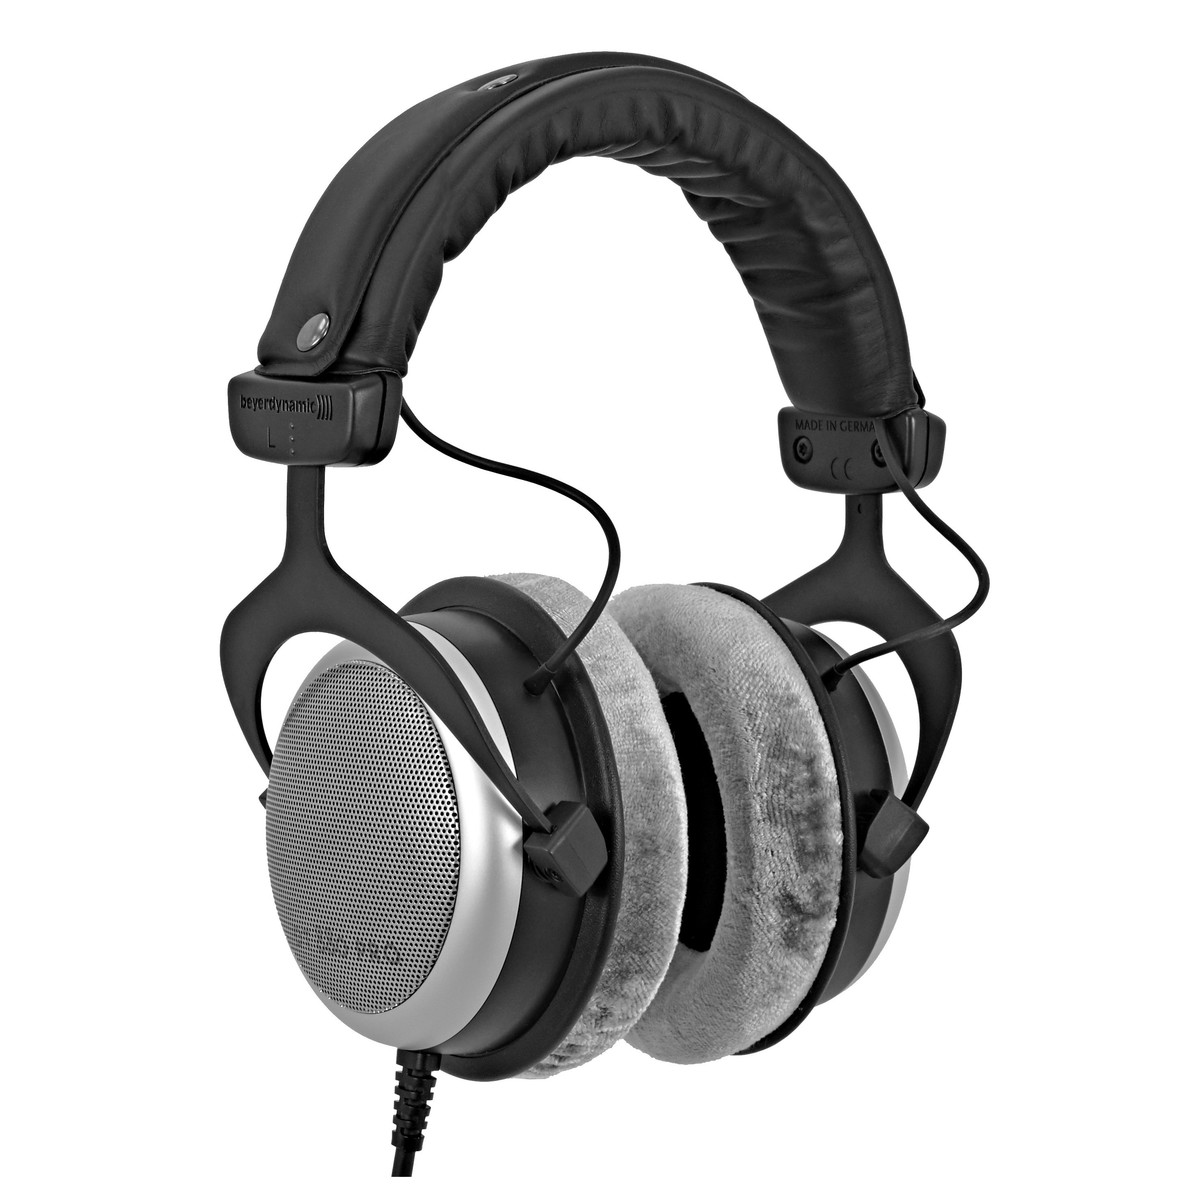 8e8e7148a67 Beyerdynamic DT 880 Pro Headphones, 250 Ohms main. Loading zoom